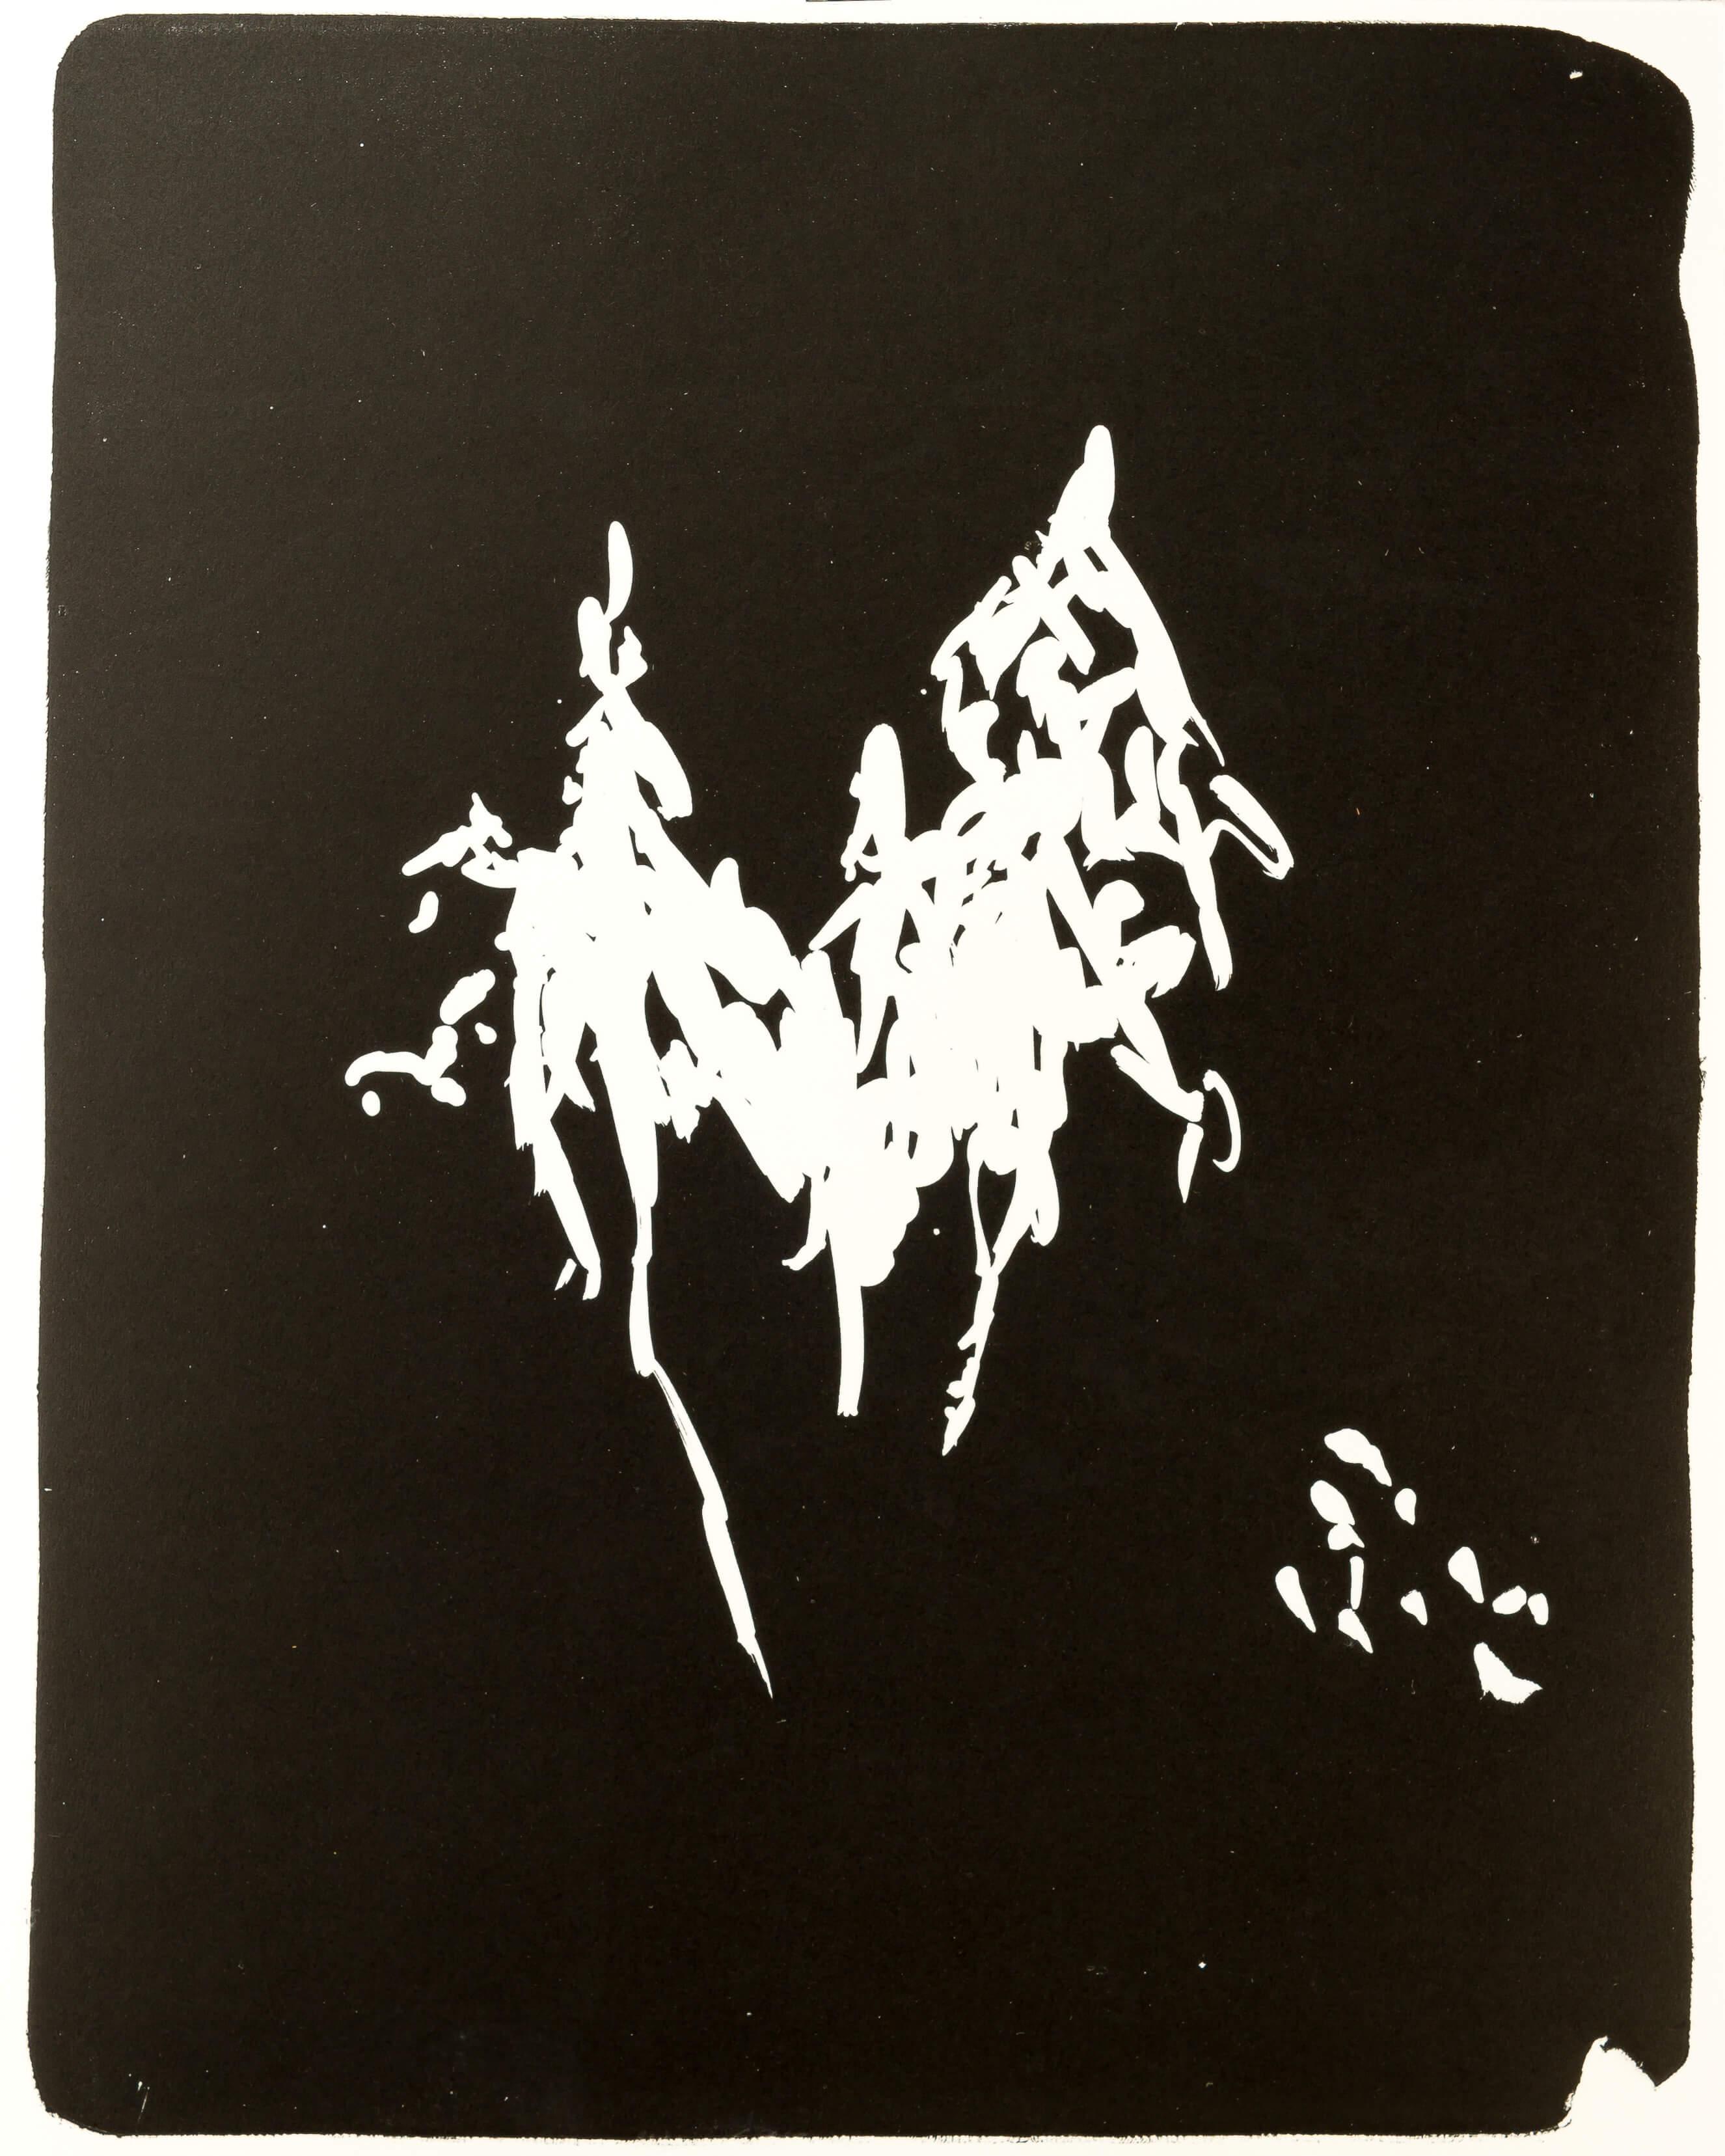 Katharina Albers, Wald X(N)-XV, 2015, Lithographie, Unikat, 50x40 cm